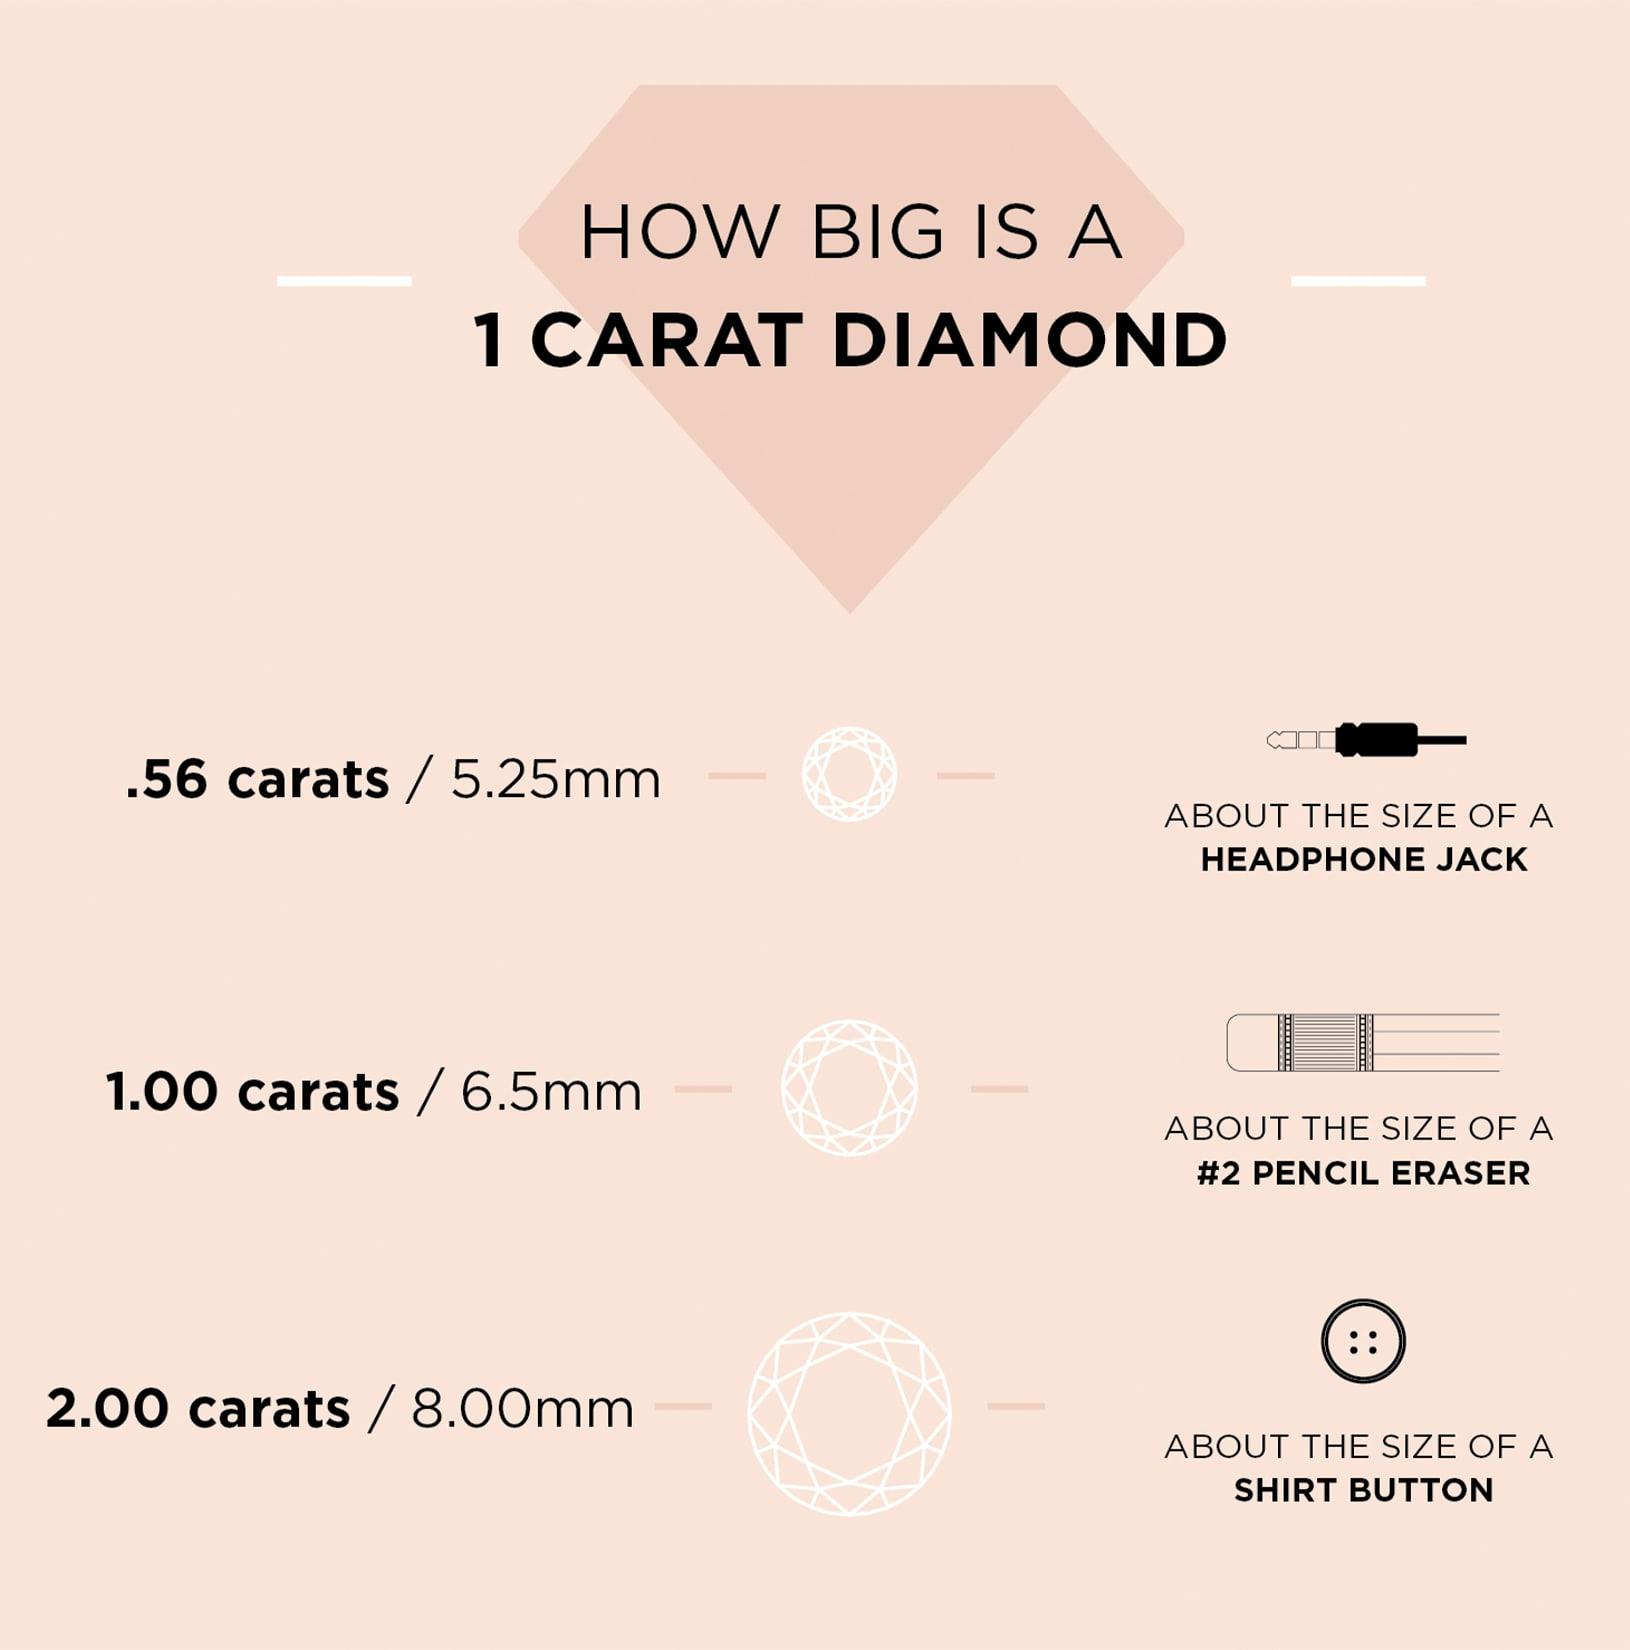 Infographic explaining how big a 1 carat diamond is